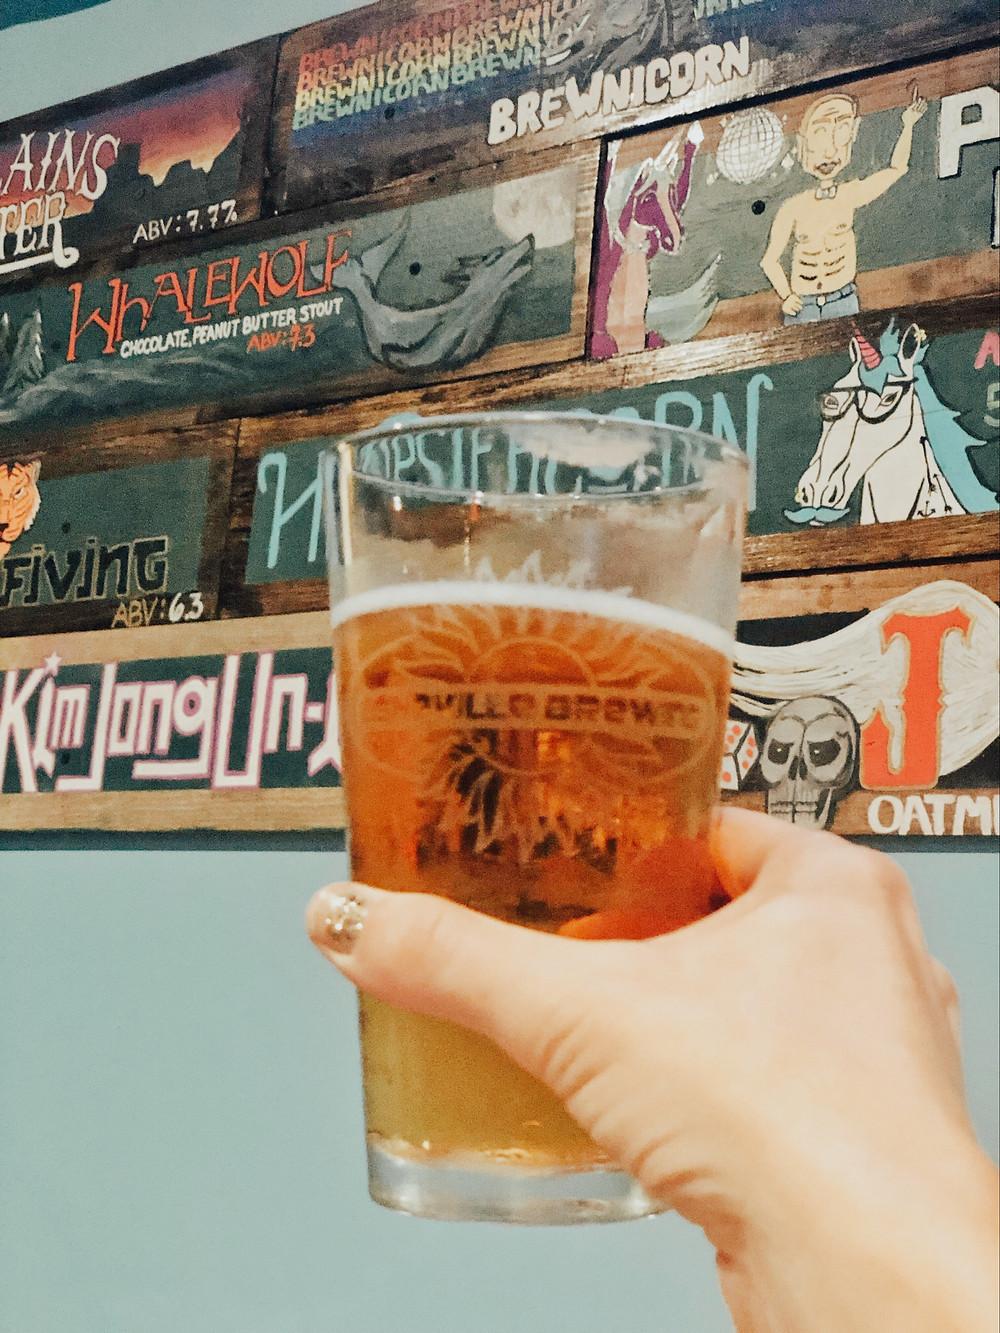 Asheville Brewing Company 828 Pale Ale downtown Asheville